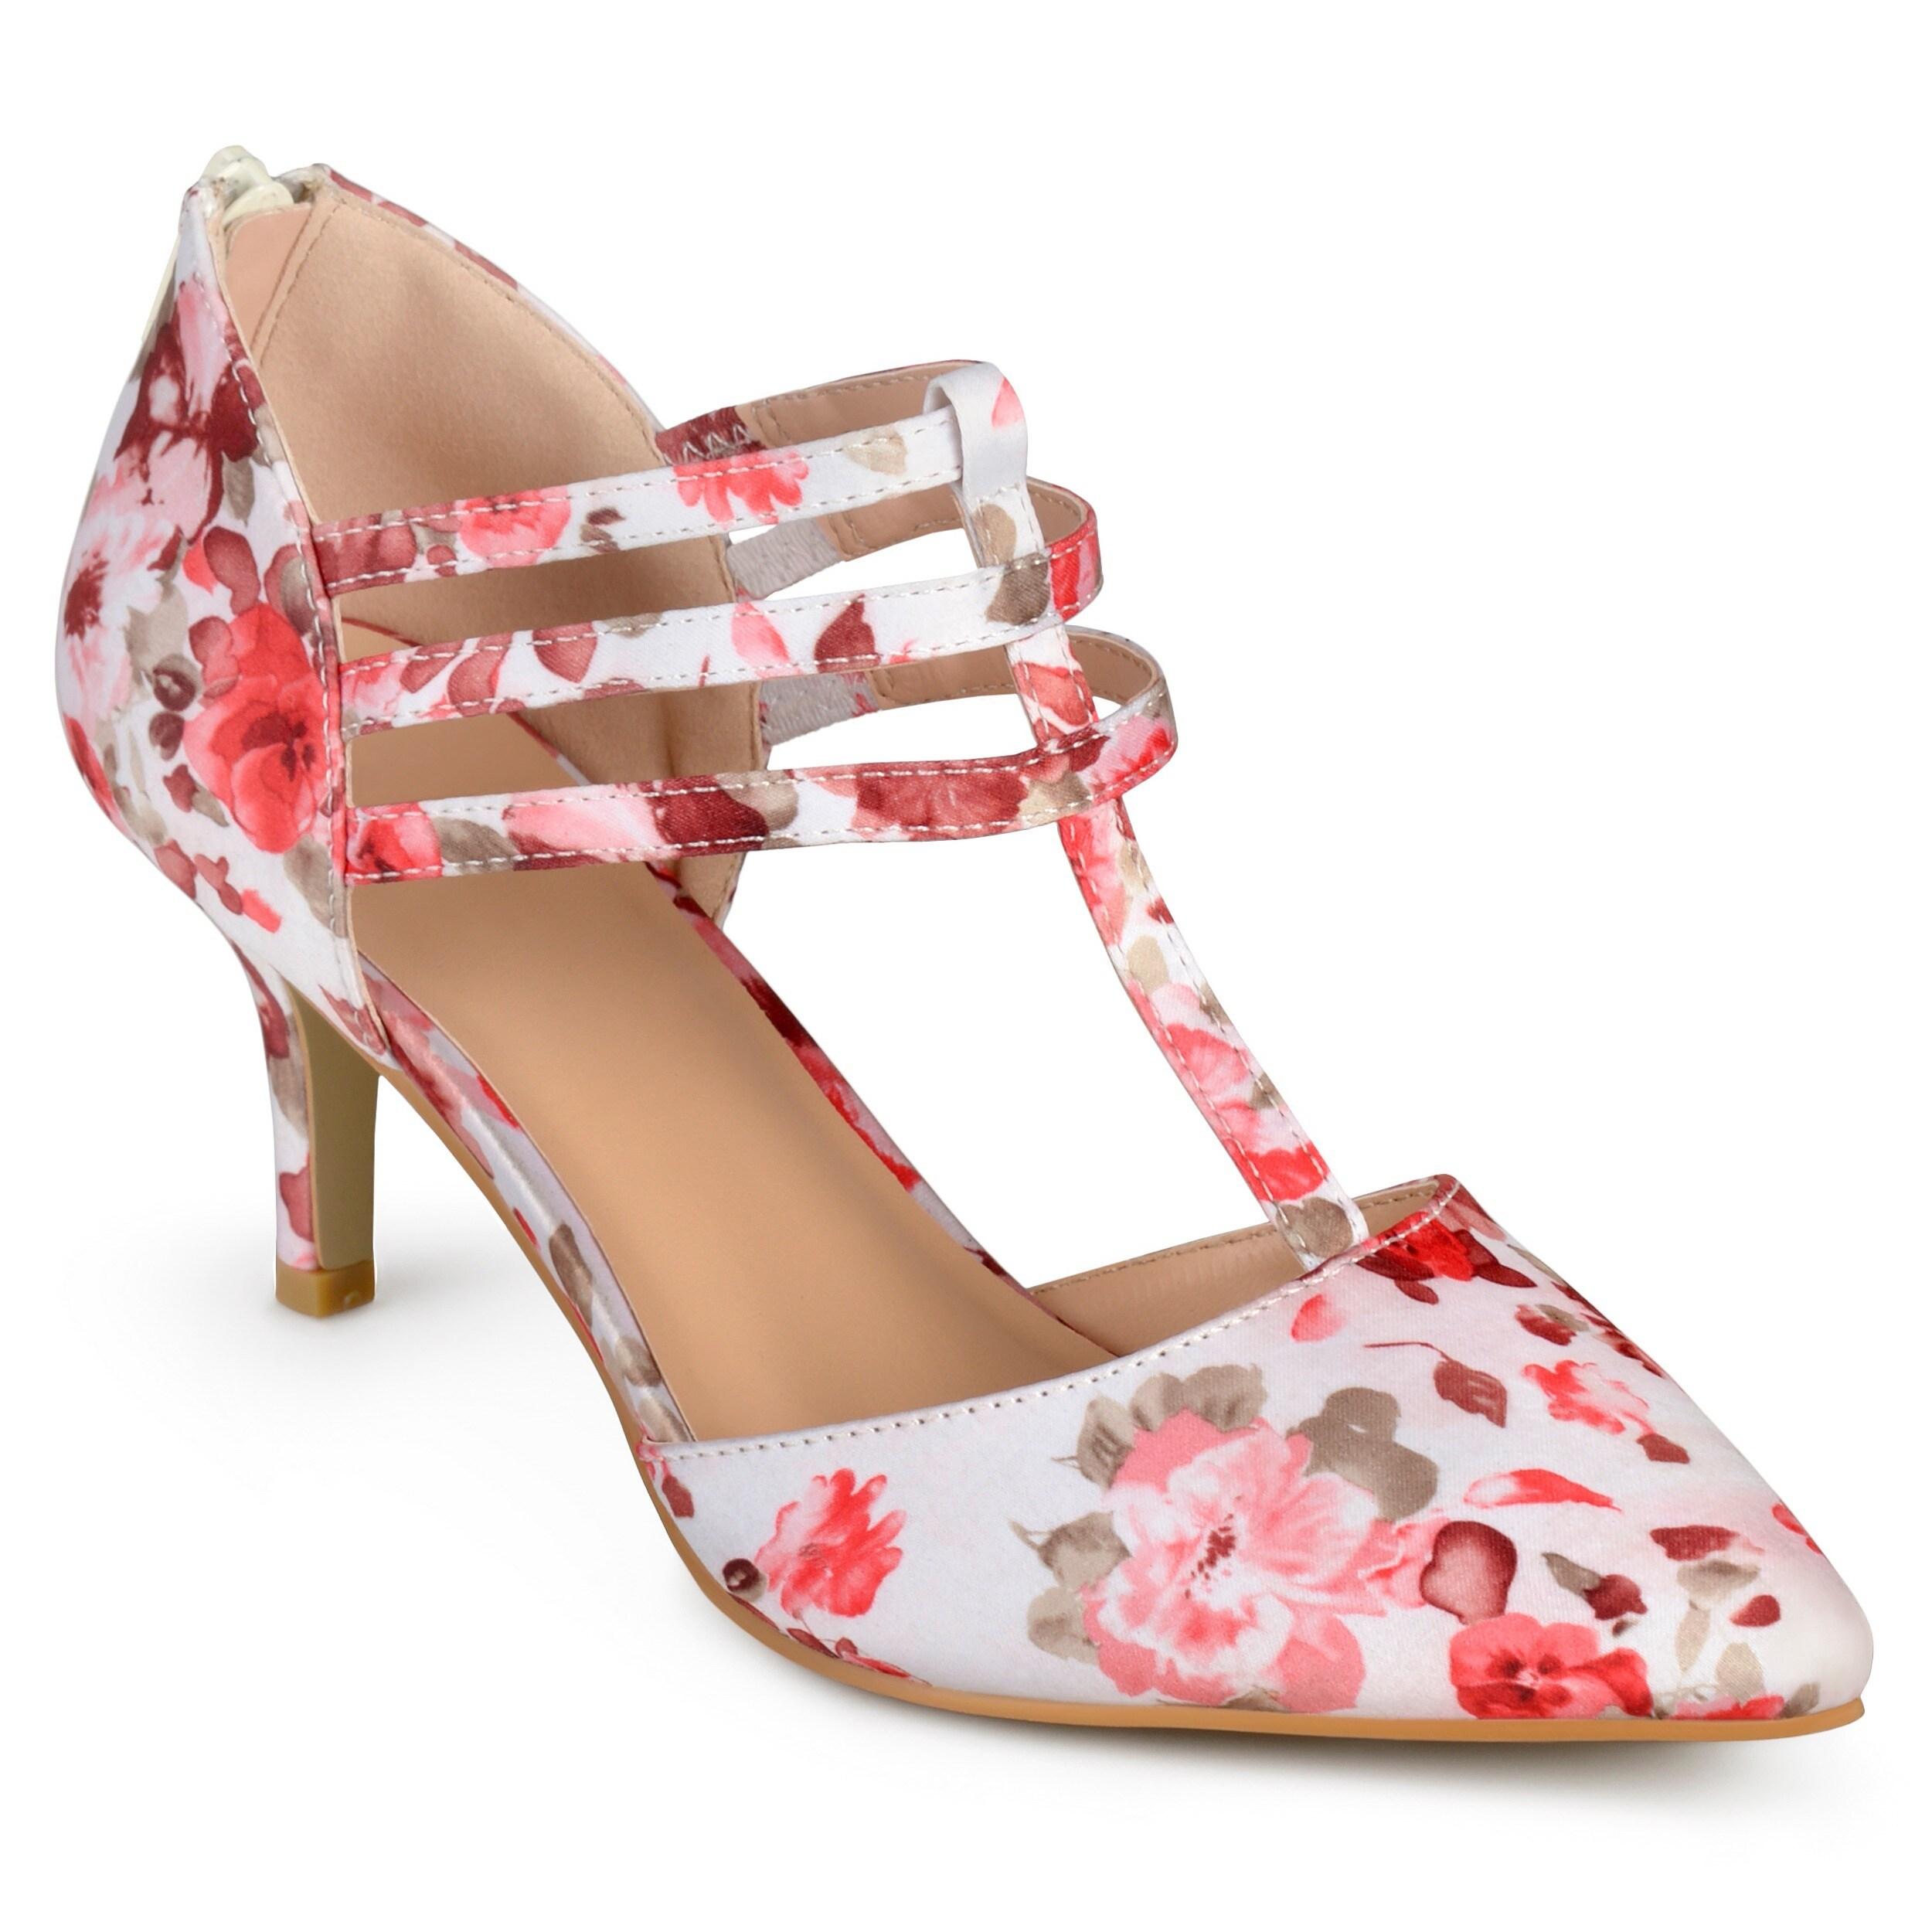 Shop Journee Collection Womens Pacey Matte T Strap High Heels